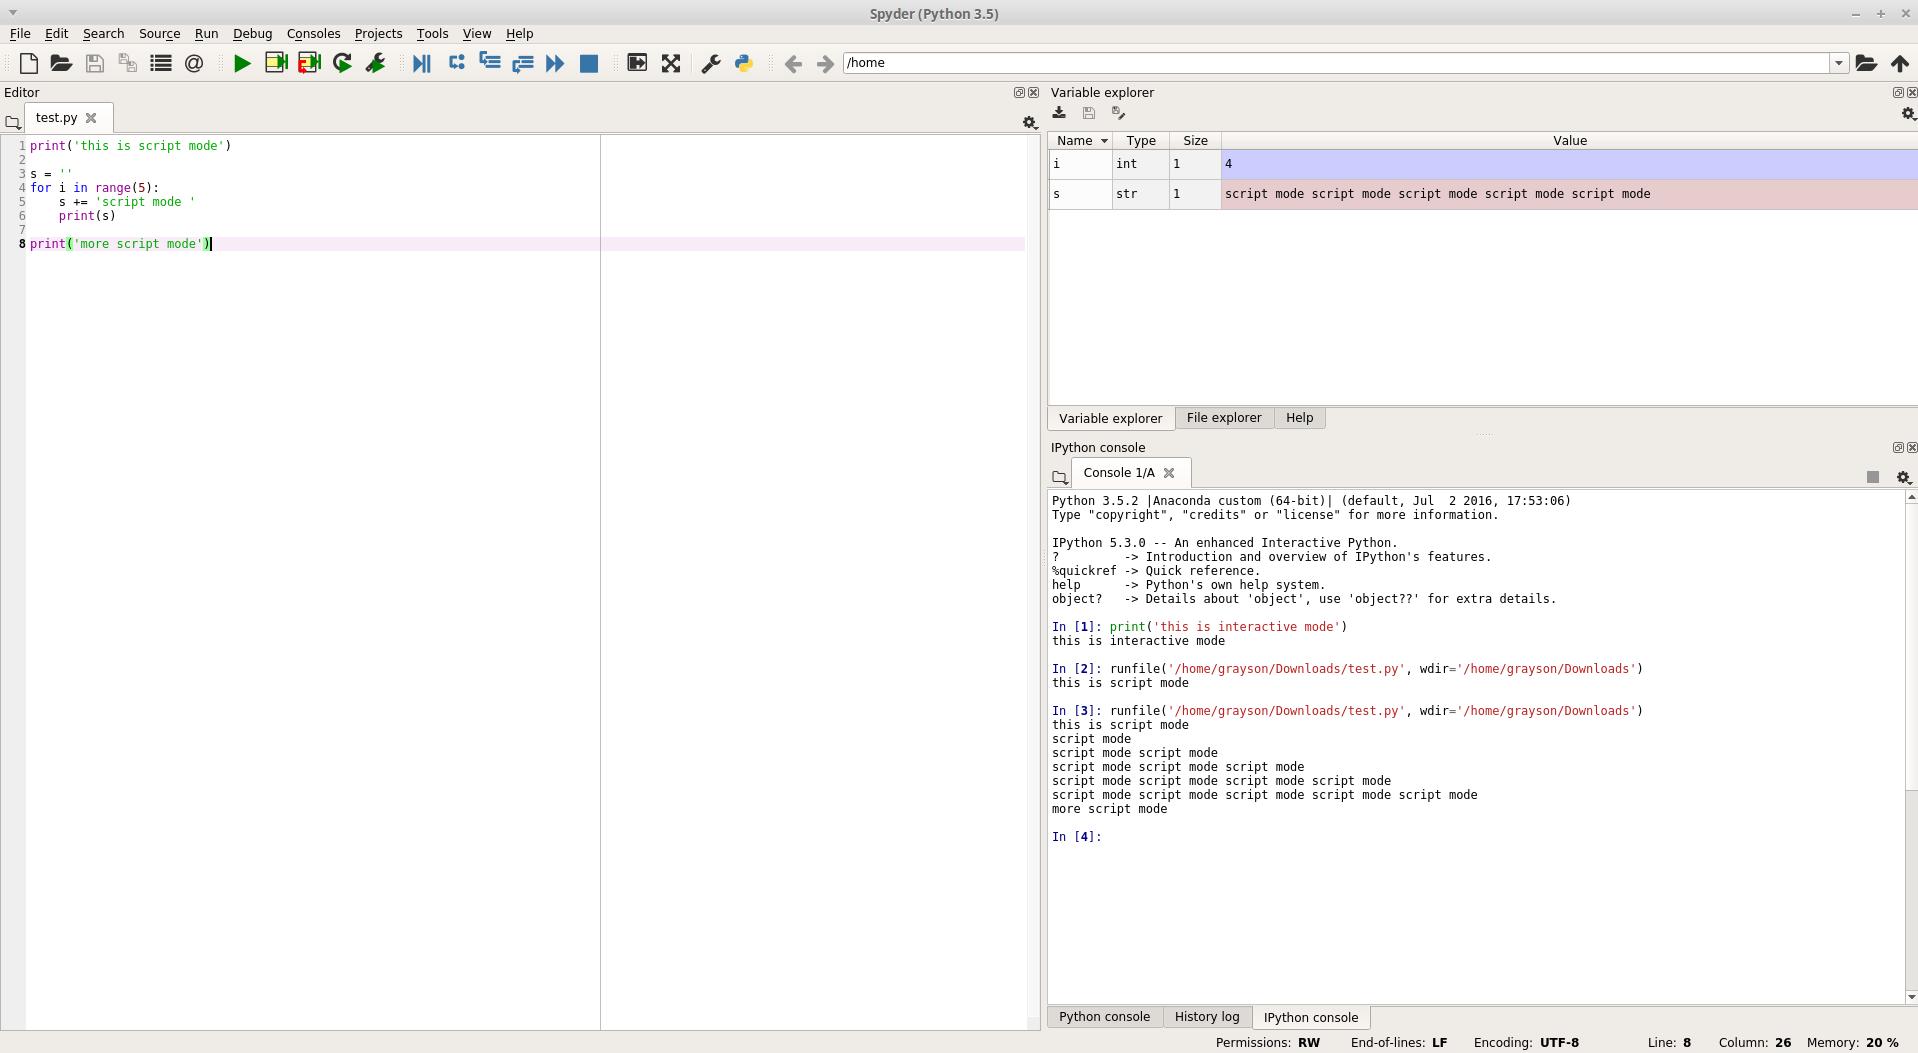 script mode example spyder 2